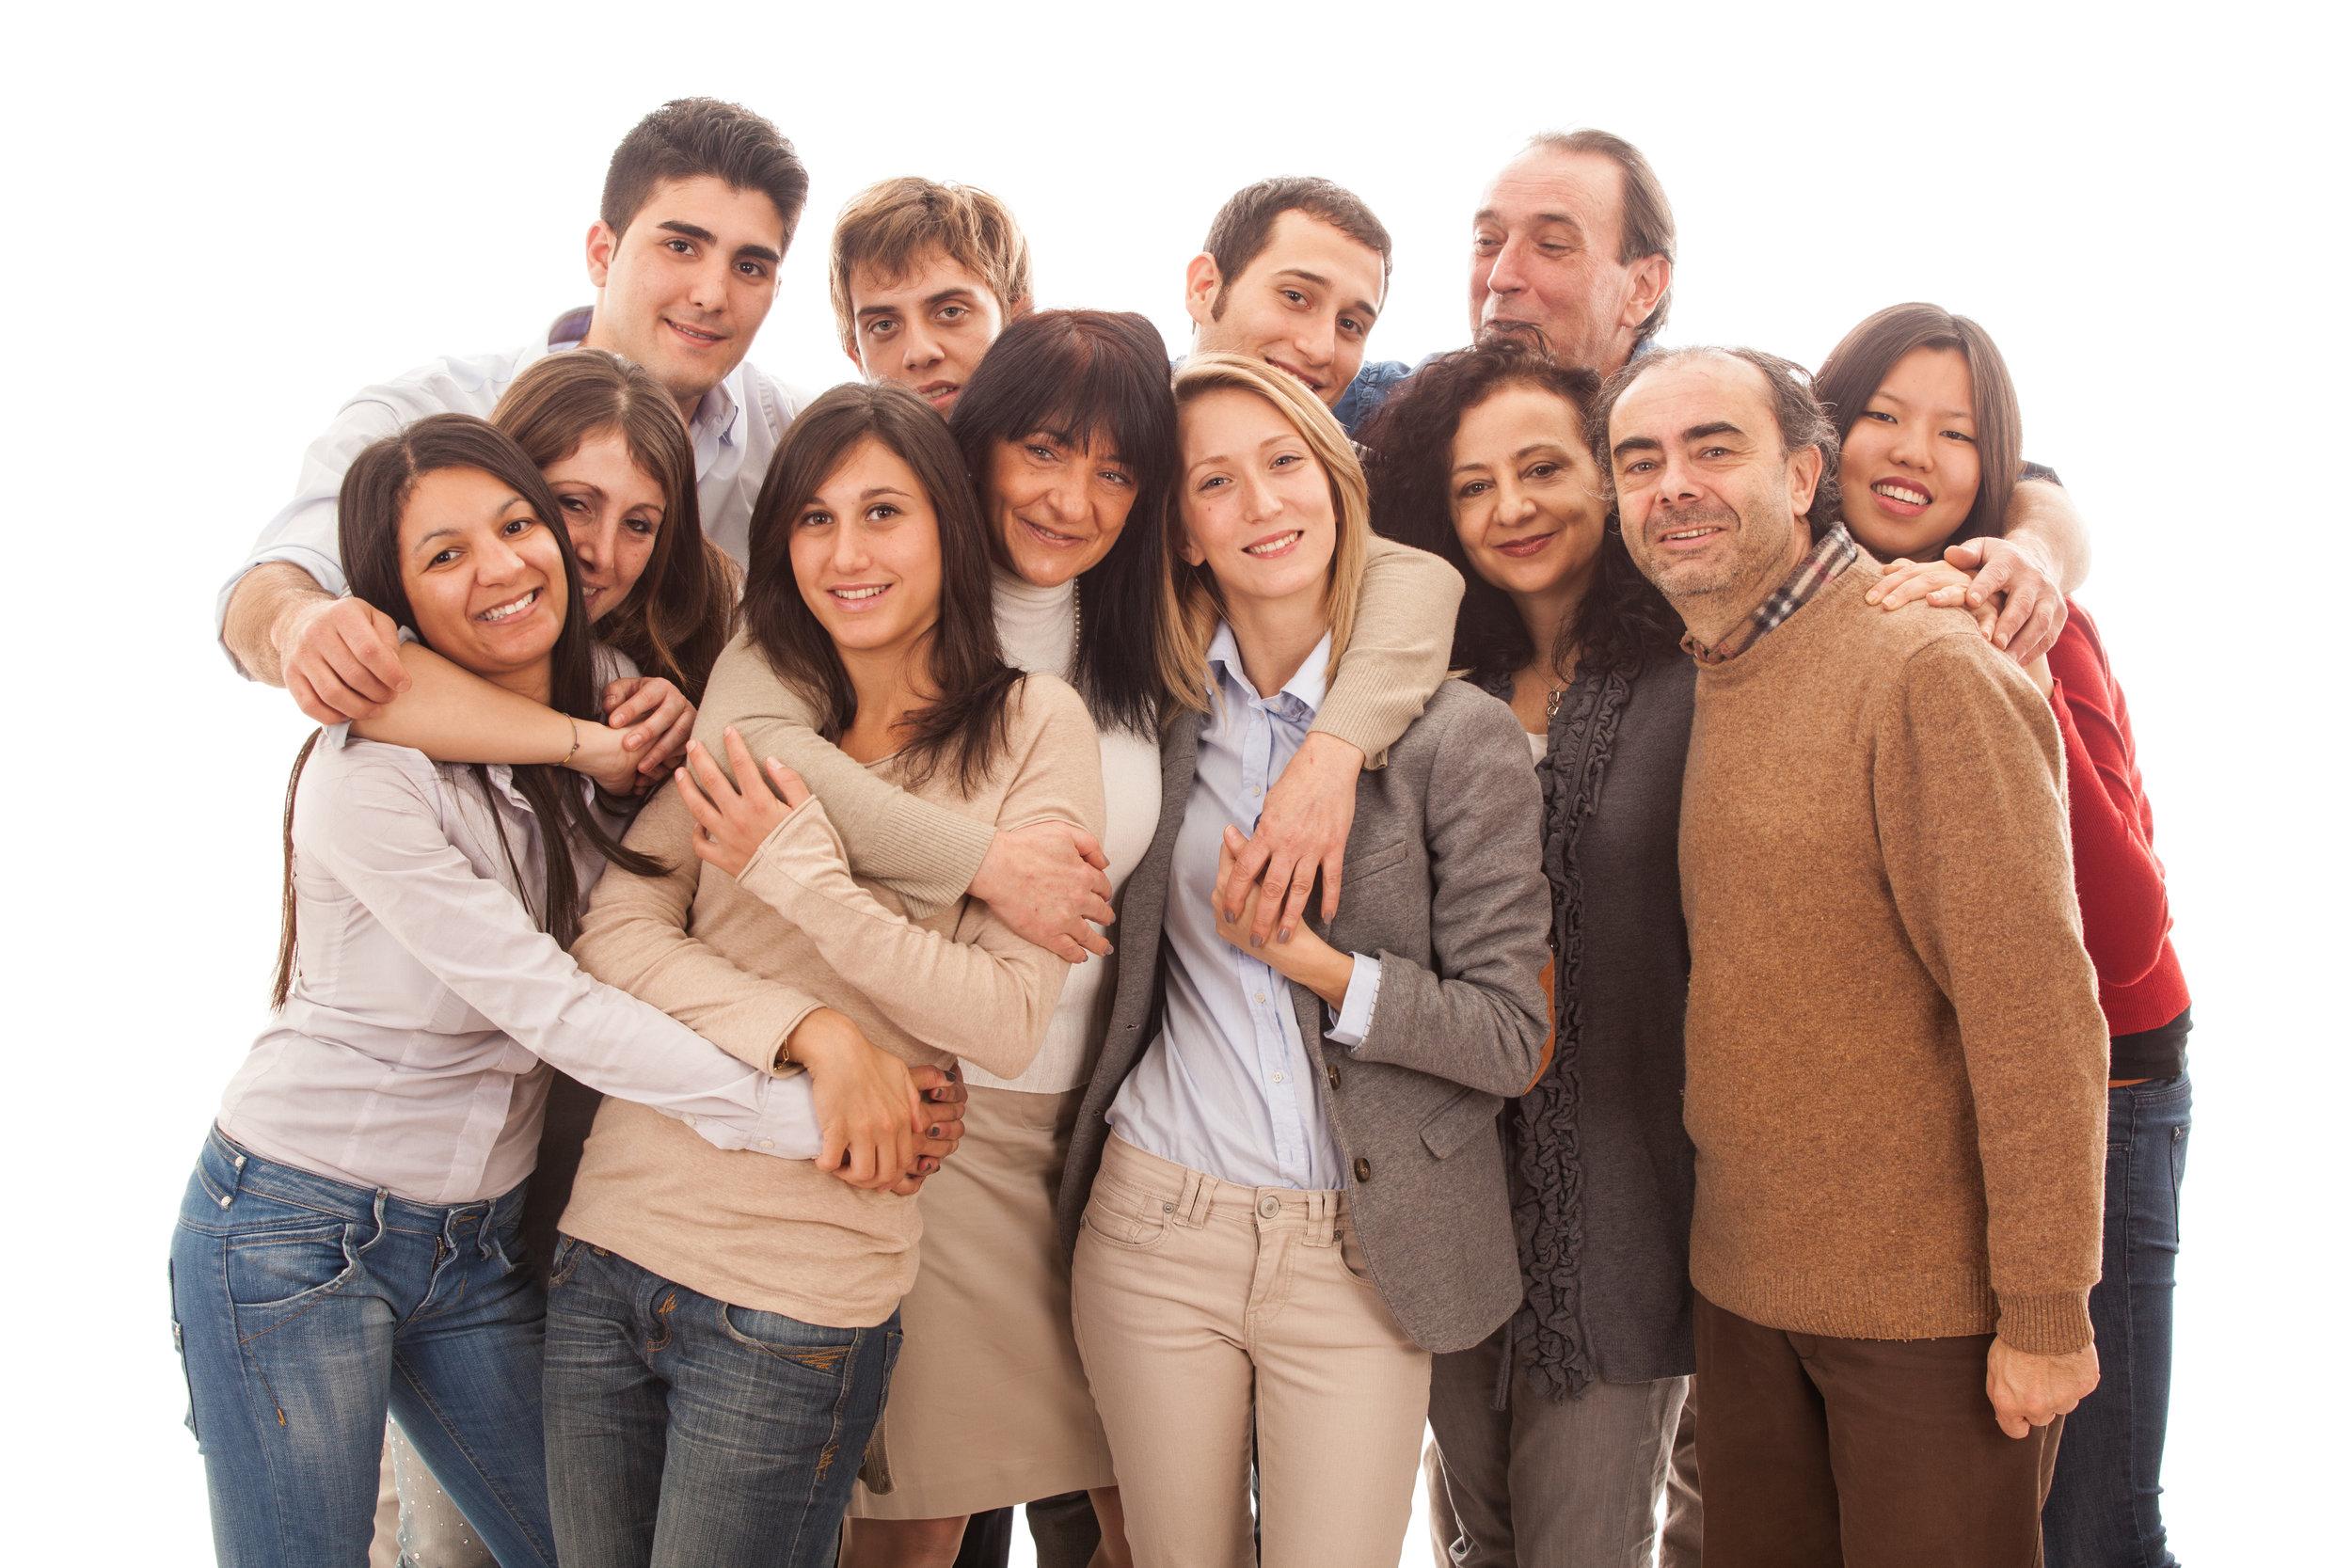 CHRISTIAN FAMILY LIFE